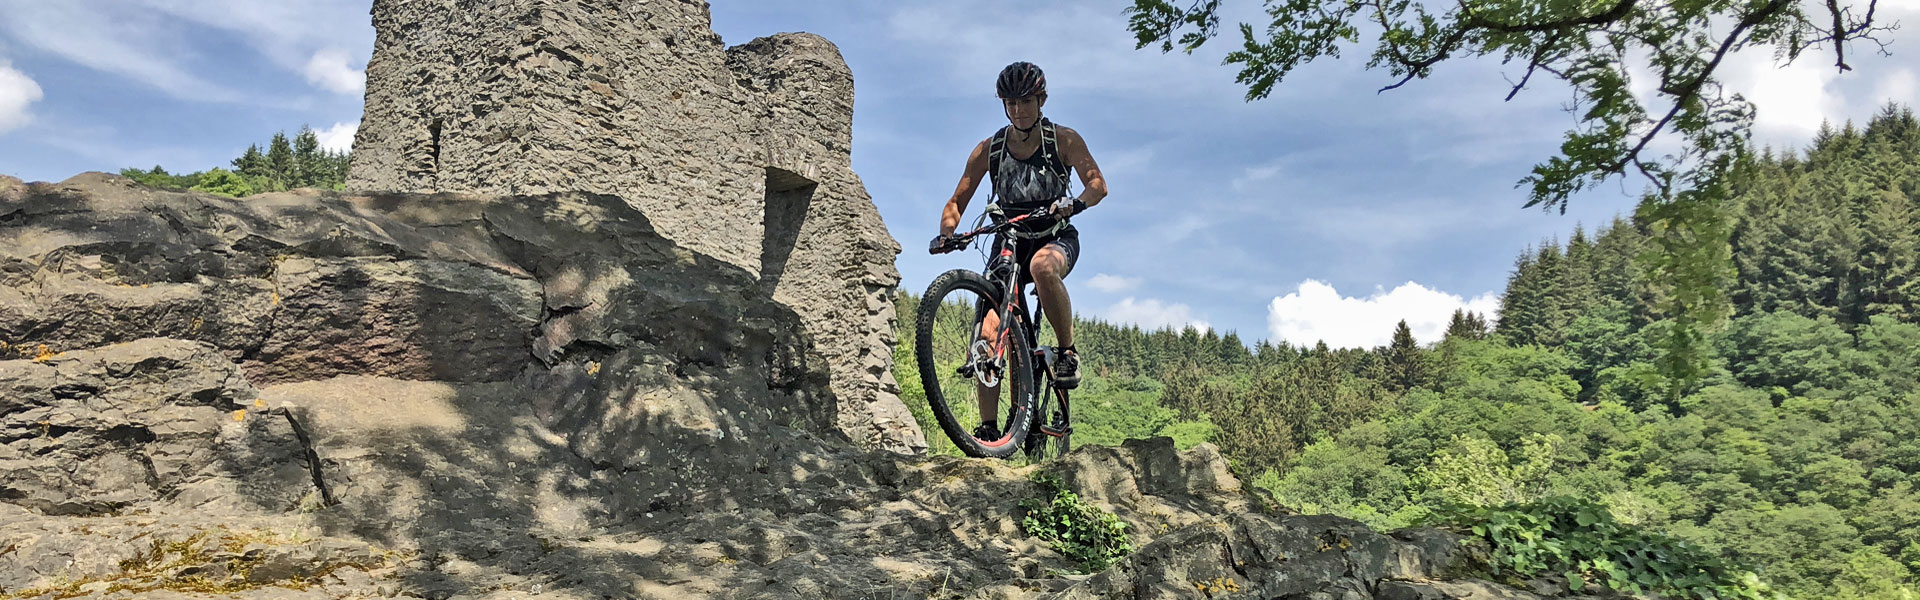 Mountainbike Level 3